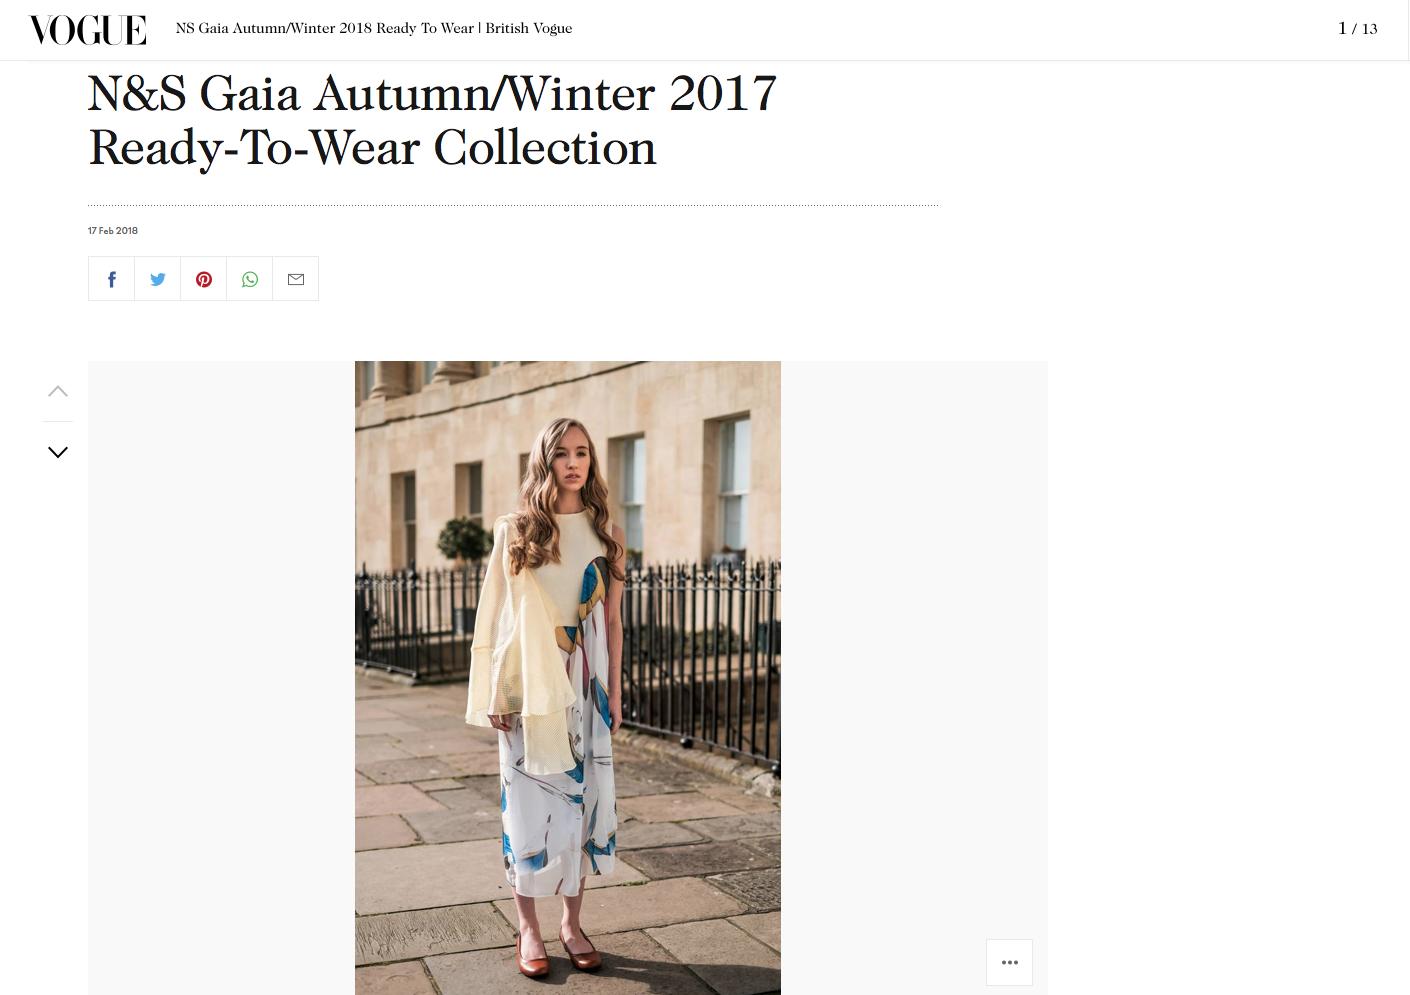 N&S Gaia Autumn Winter 2017 Vogue